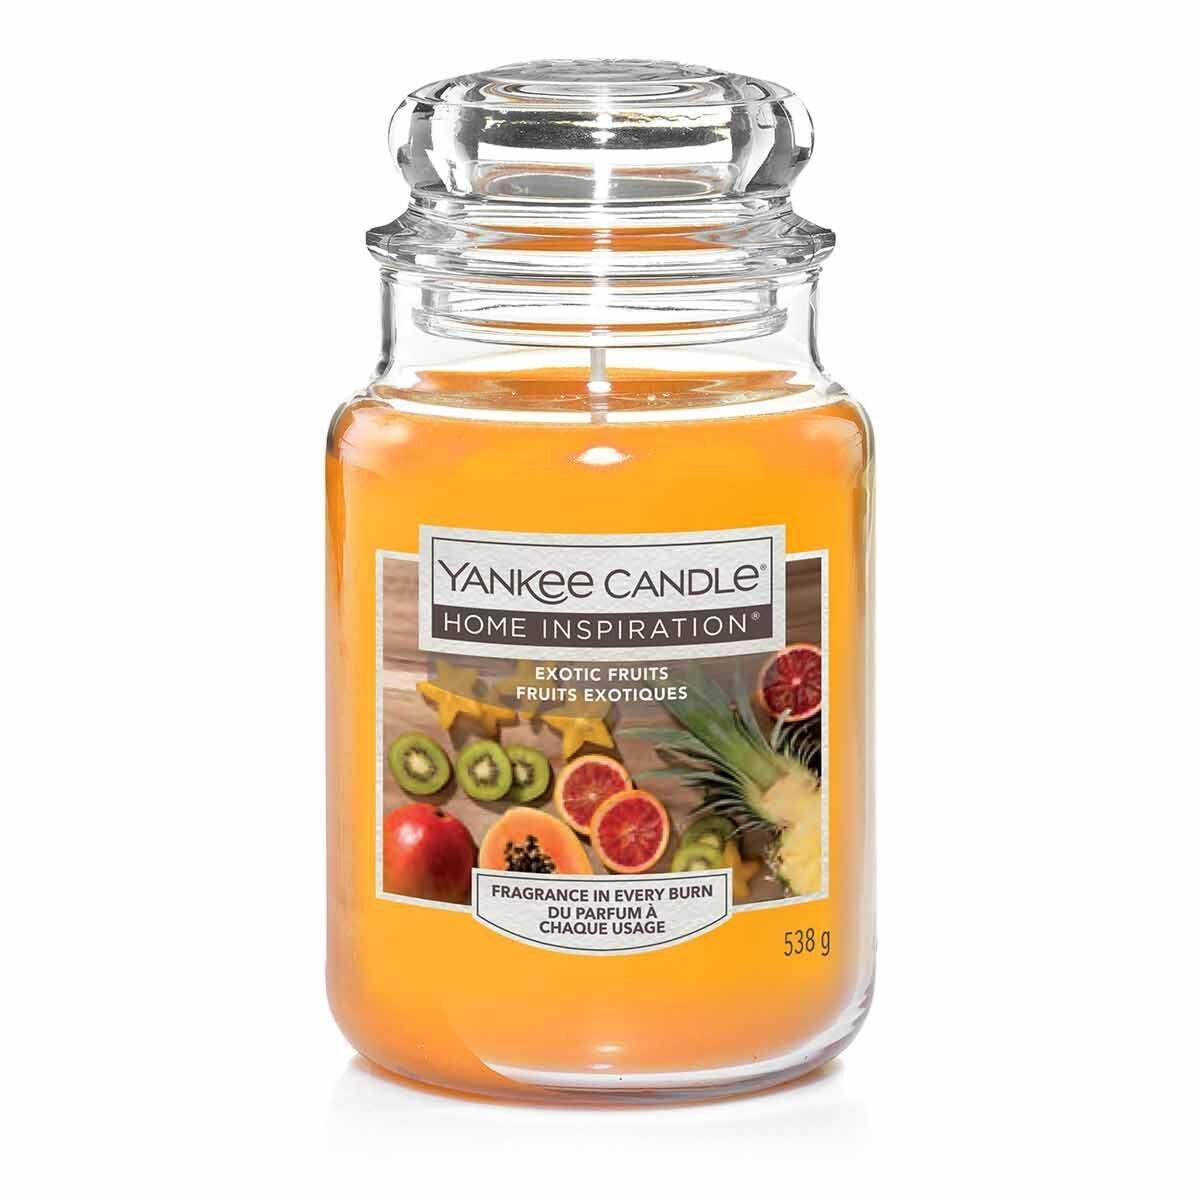 Yankee Candle Home Inspiration Large Jar Exotic Fruits